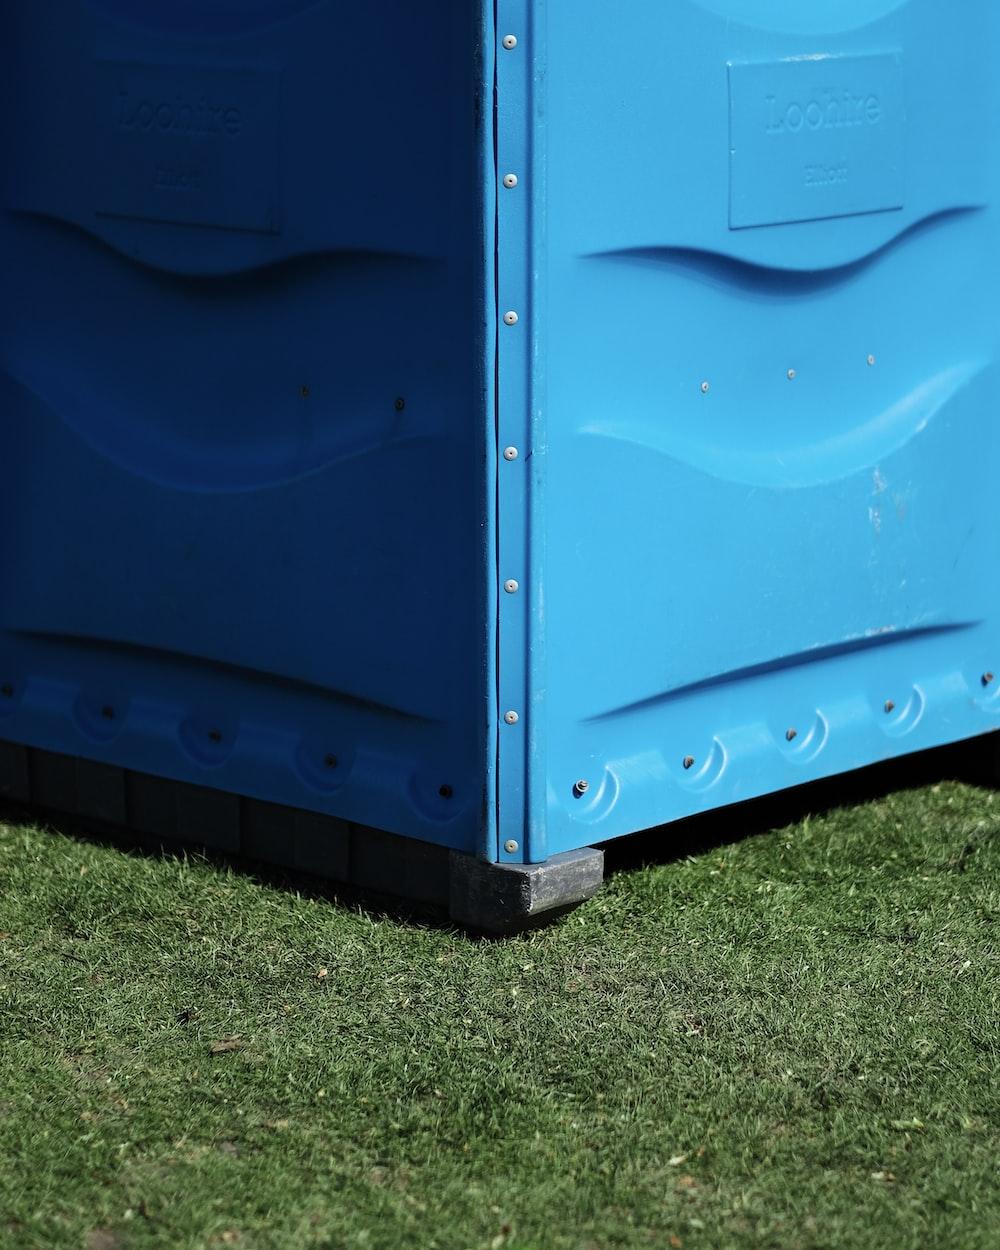 blue metal storage box on green grass